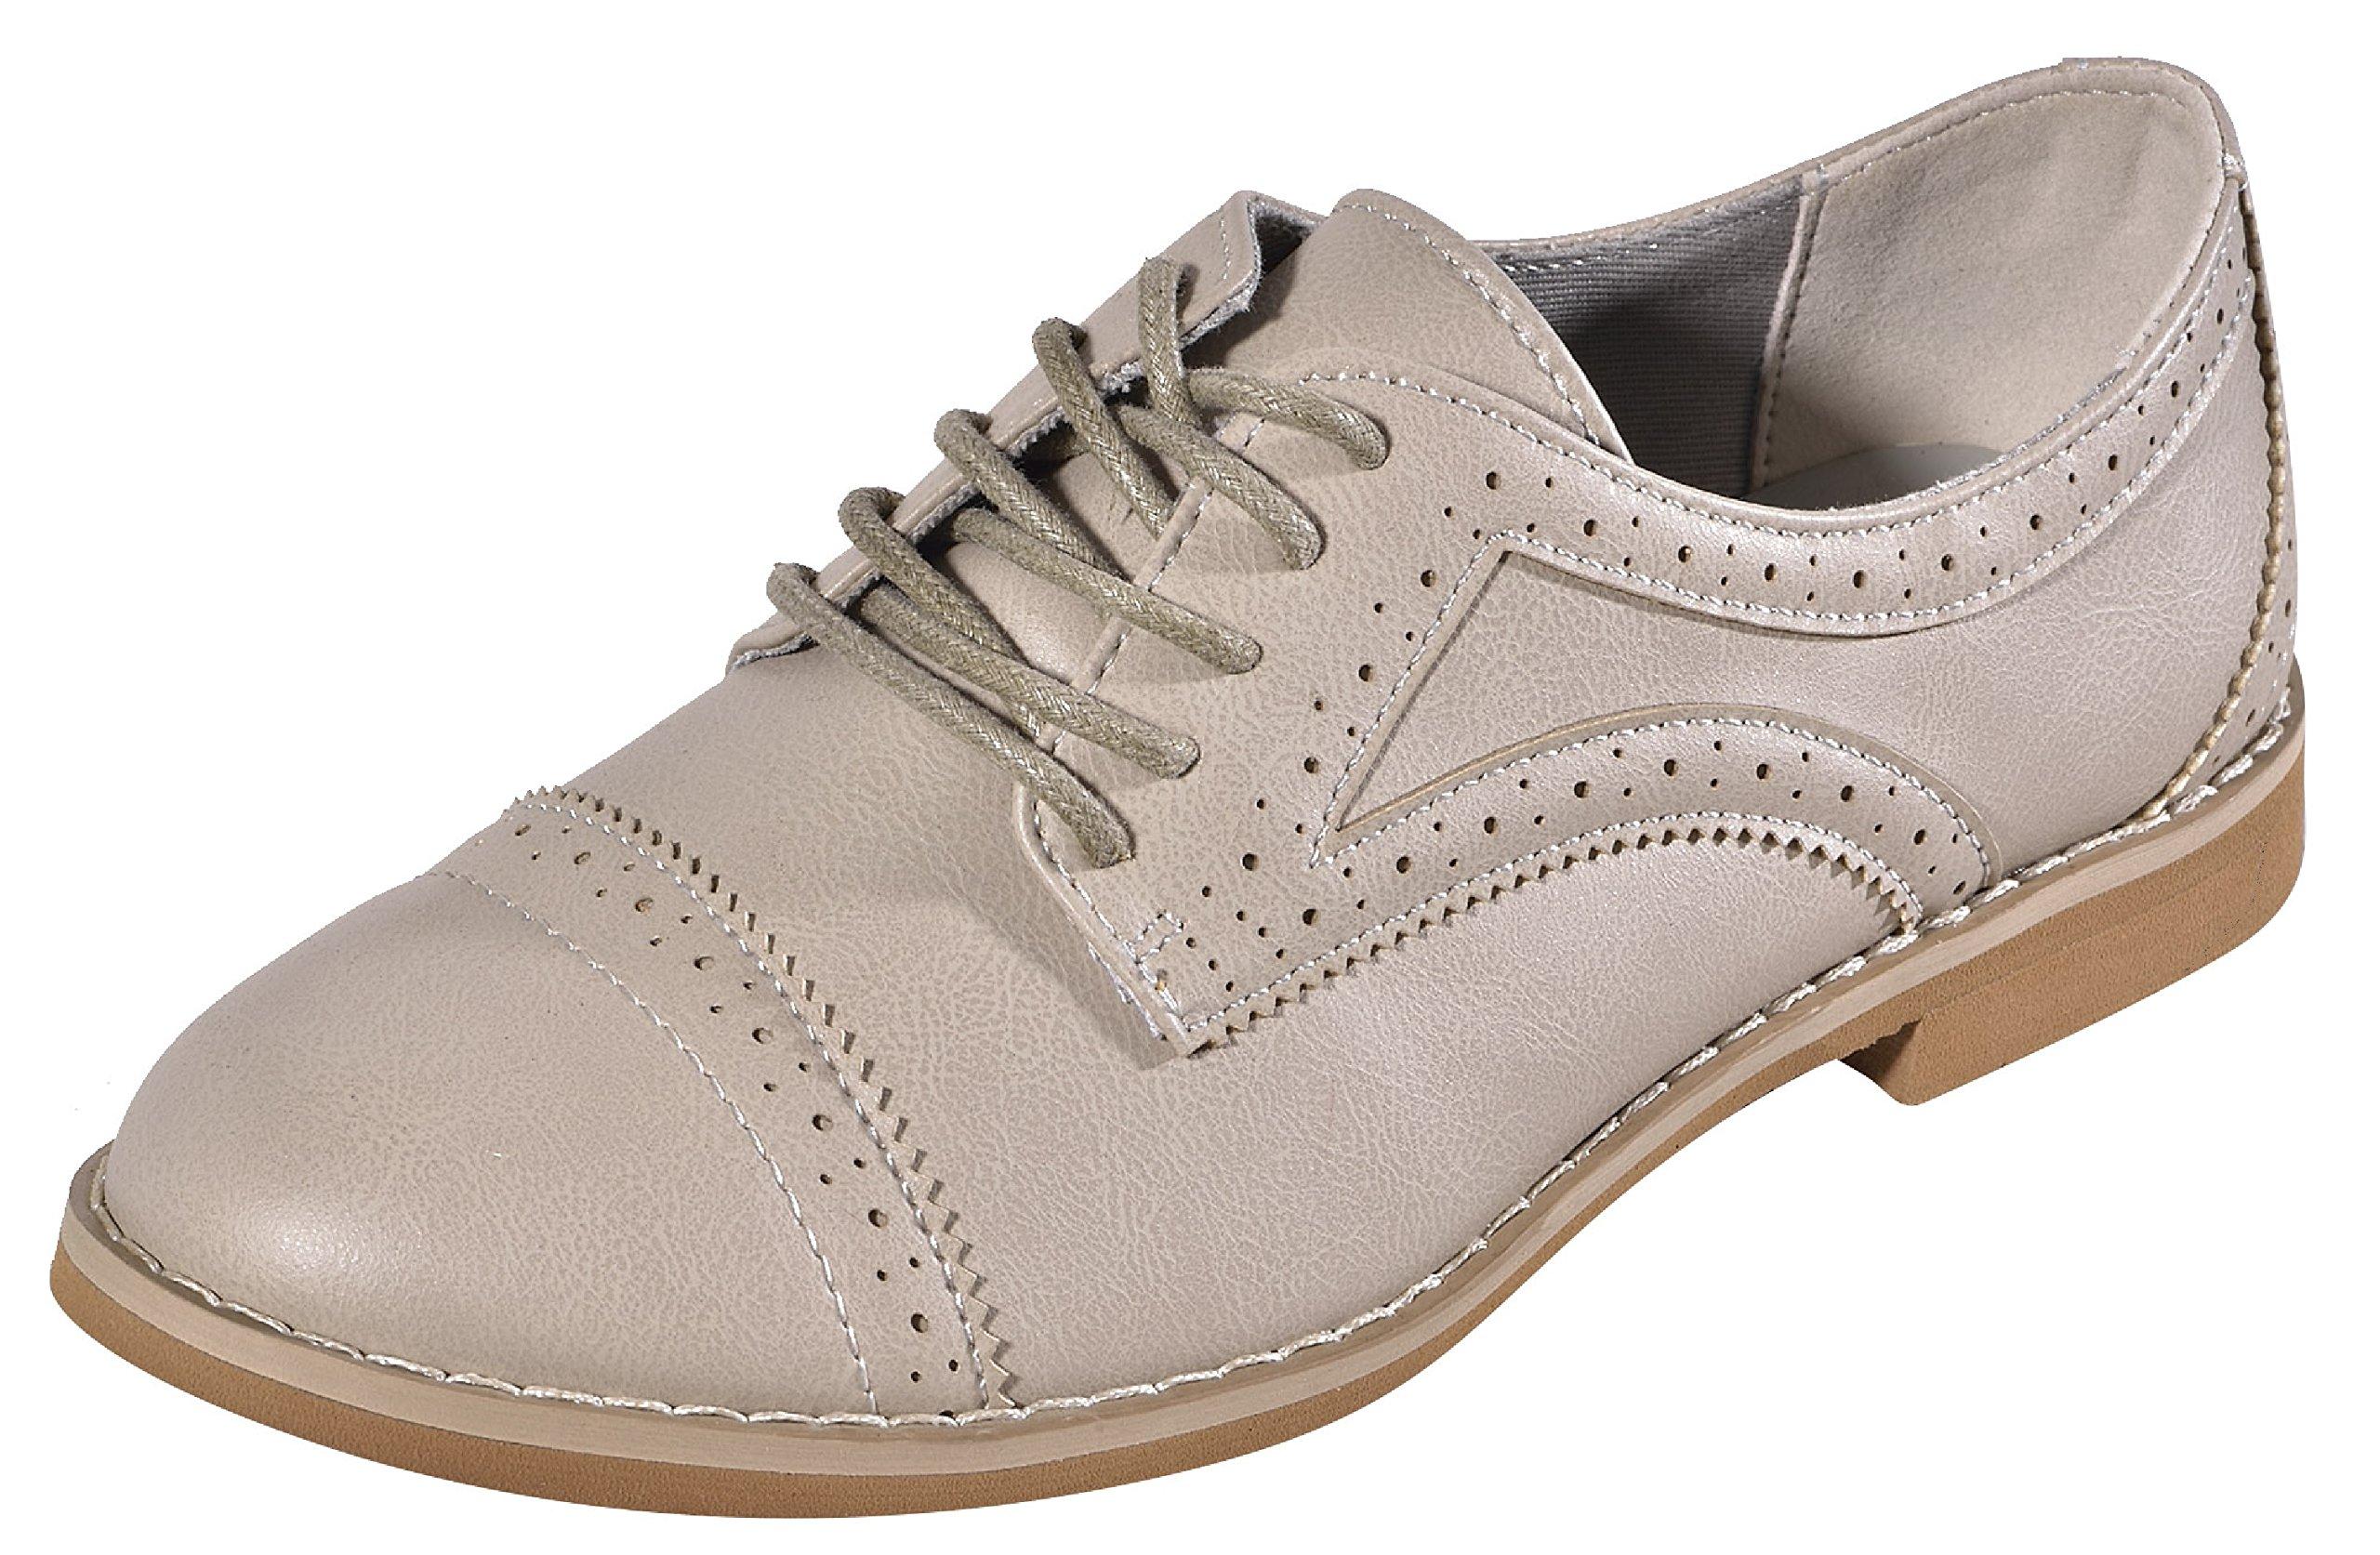 Summer Clearance Sale Top Elegant Alyn Gray Faux Leather Oxford Laceup Best Round Toe Small Heel Flex Flat Wingtip Office Dressy Light Fall Sneaker Shoe Women Teen Girl (Size 8, Gray)